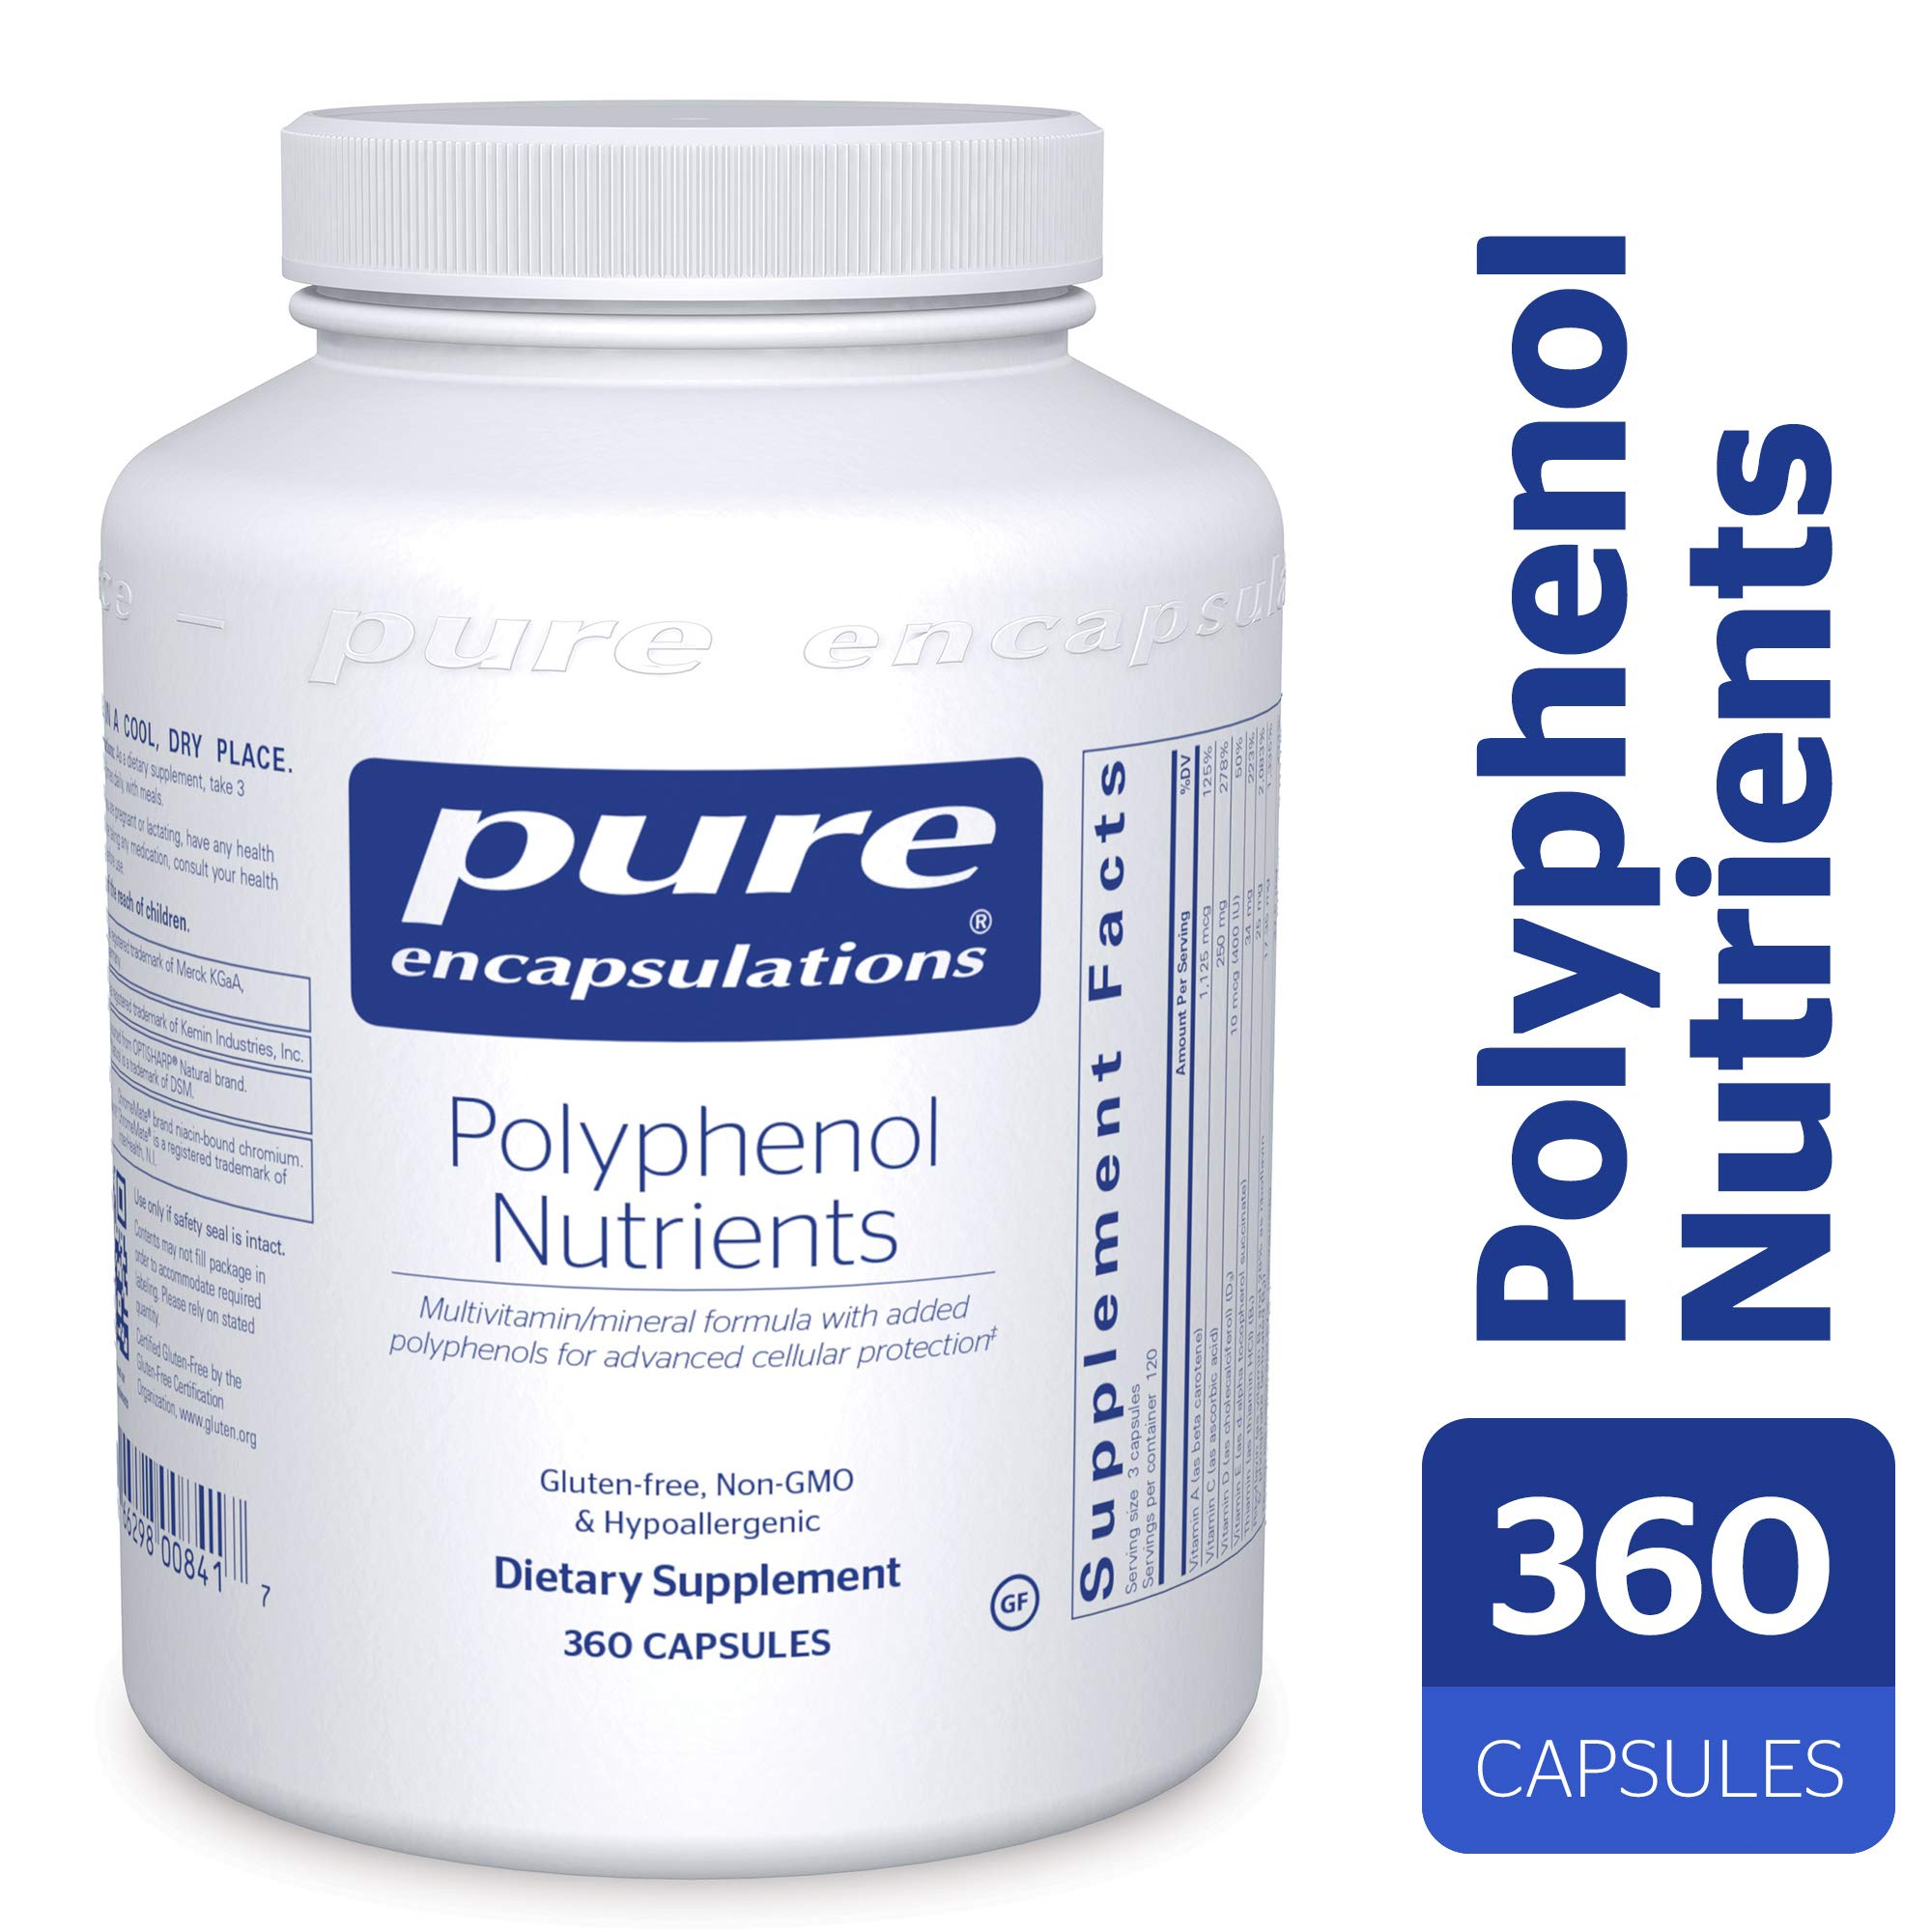 Pure Encapsulations - Polyphenol Nutrients - Hypoallergenic Nutrient Dense Multivitamin/Mineral Formula - 360 Capsules